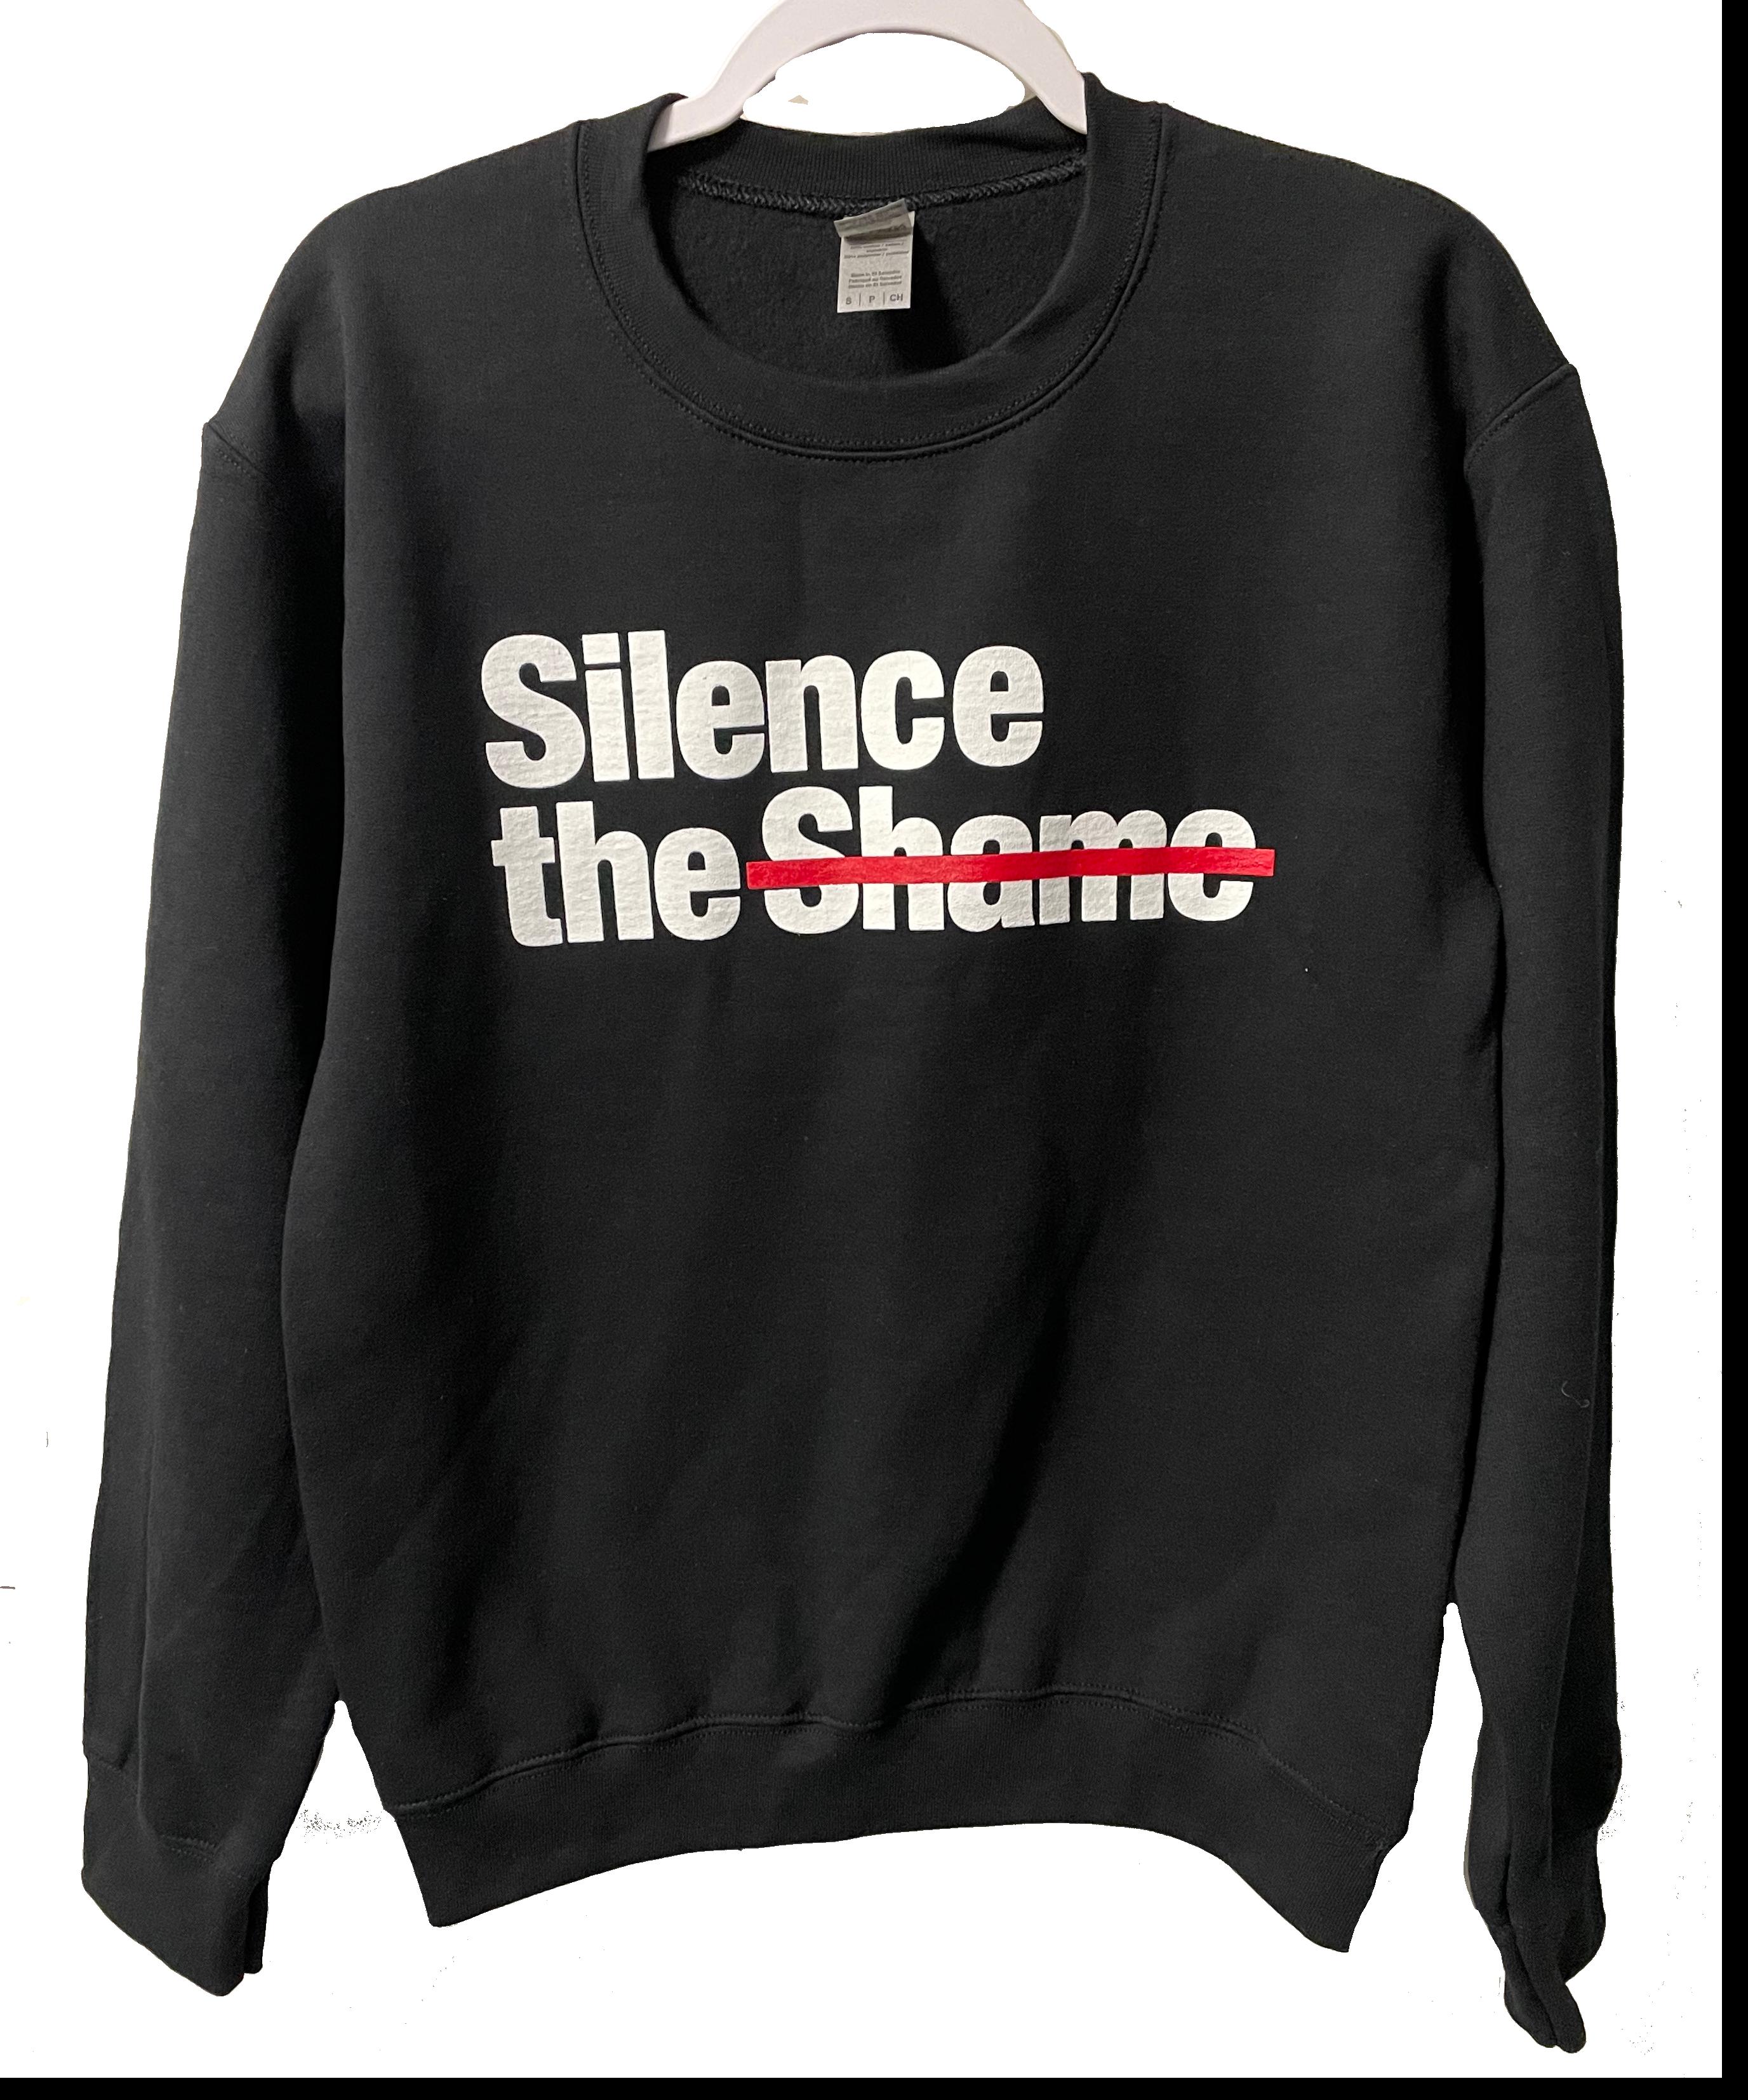 Silence the Shame Signature Black Crewneck Sweatshirt S